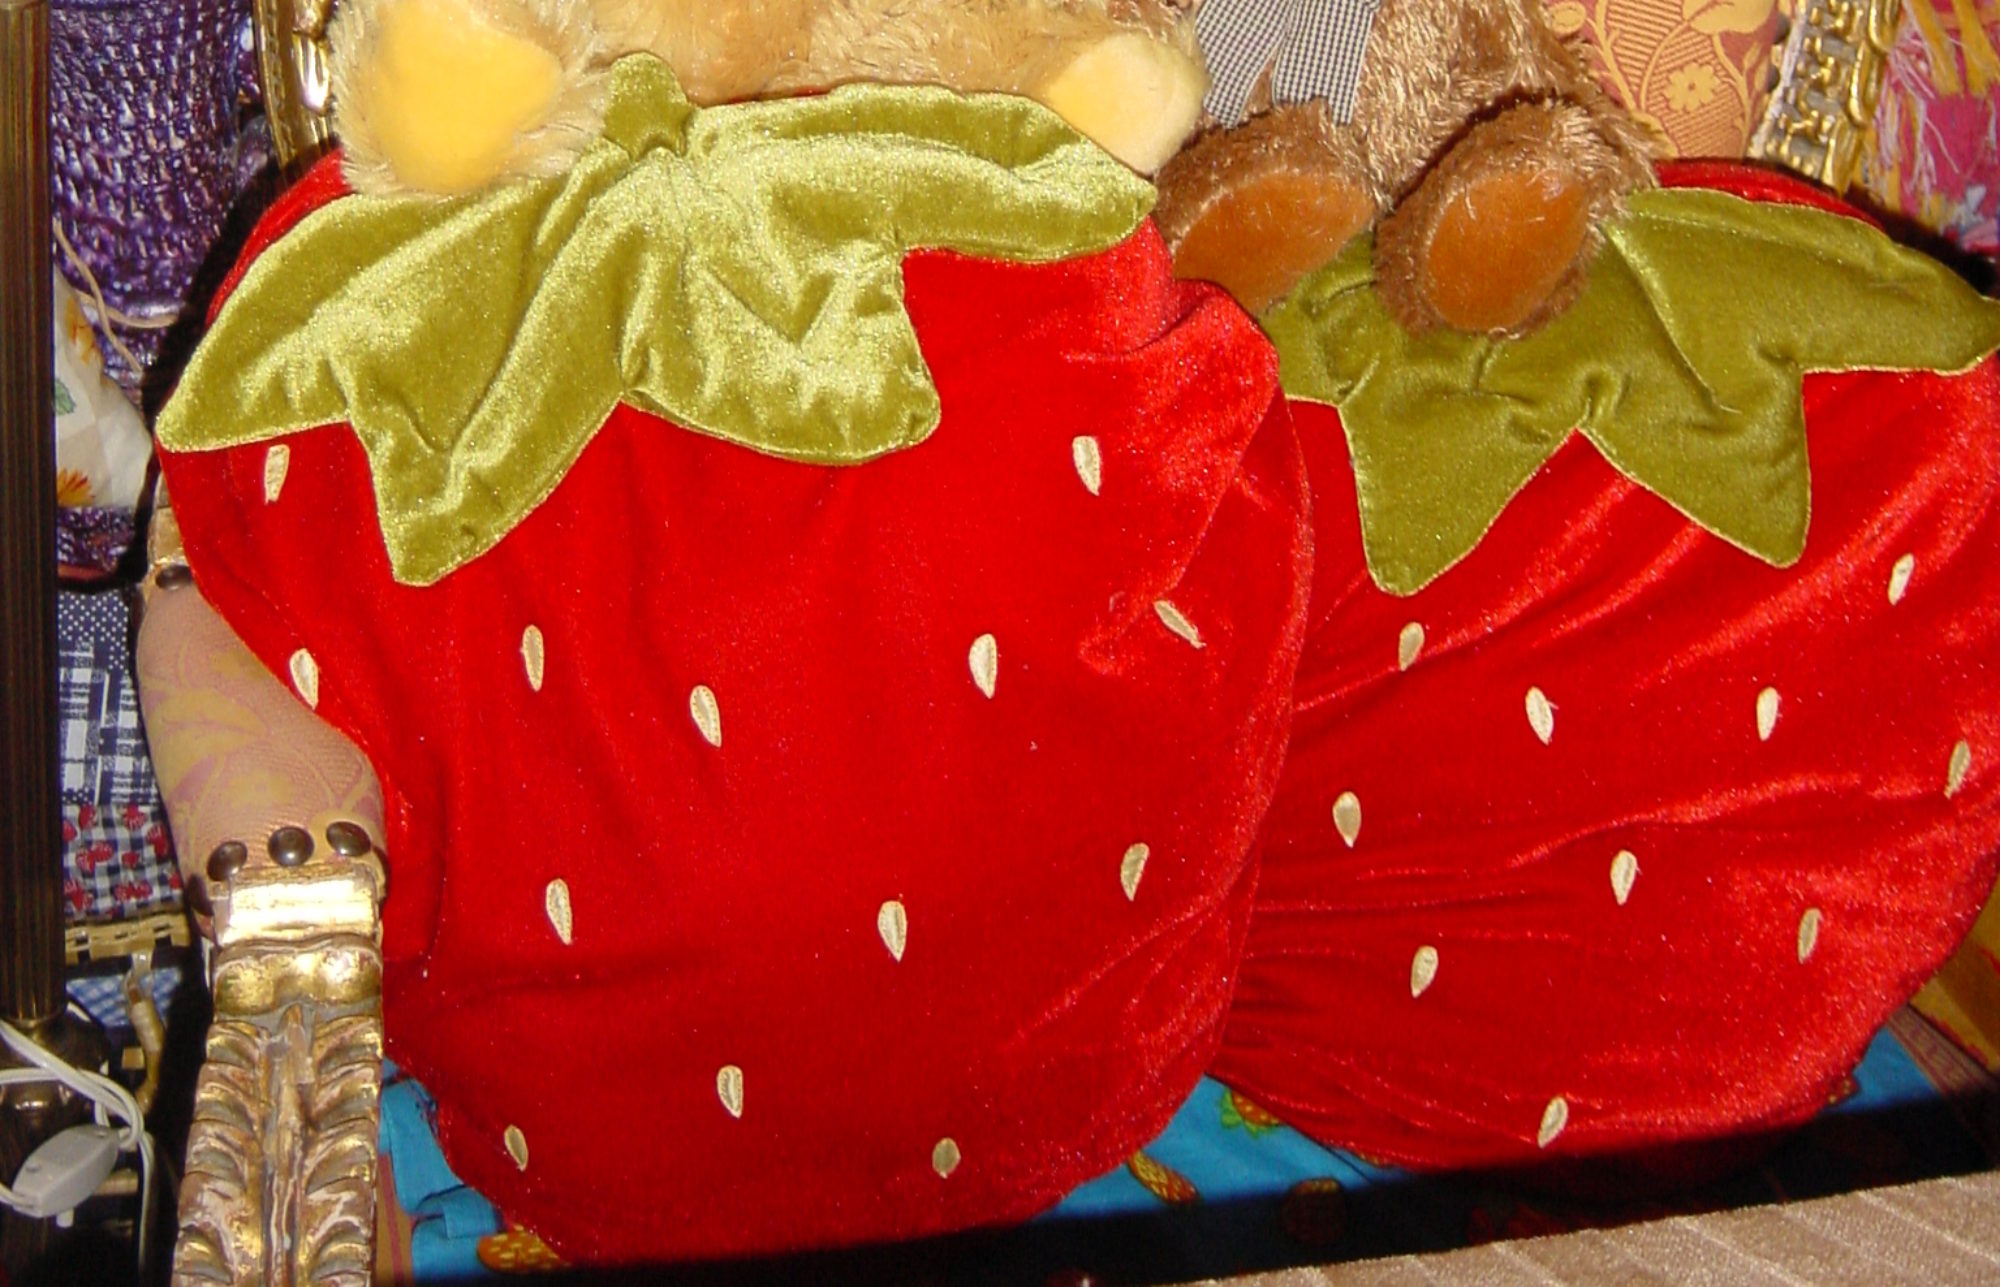 Strawberry.nl